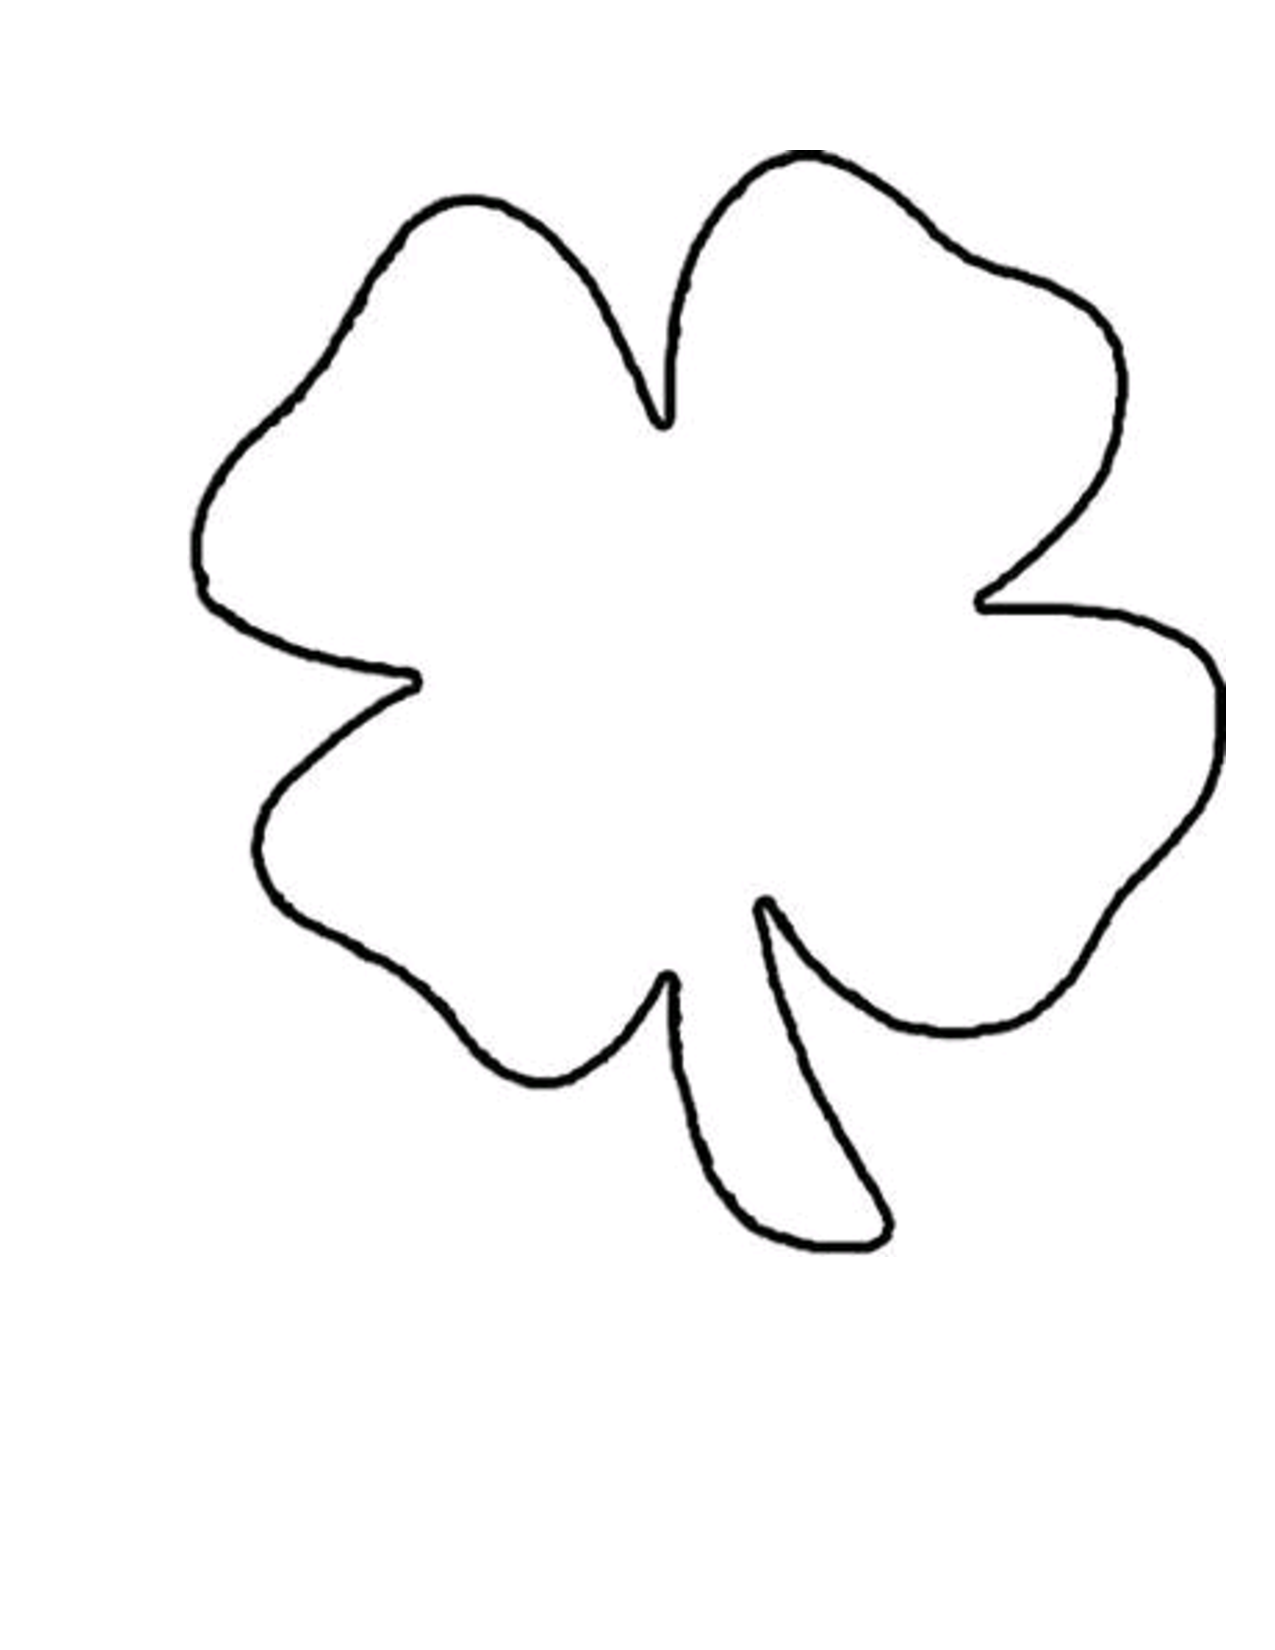 Free coloring pages shamrock - Shamrock Templates Printable Shamrock Template